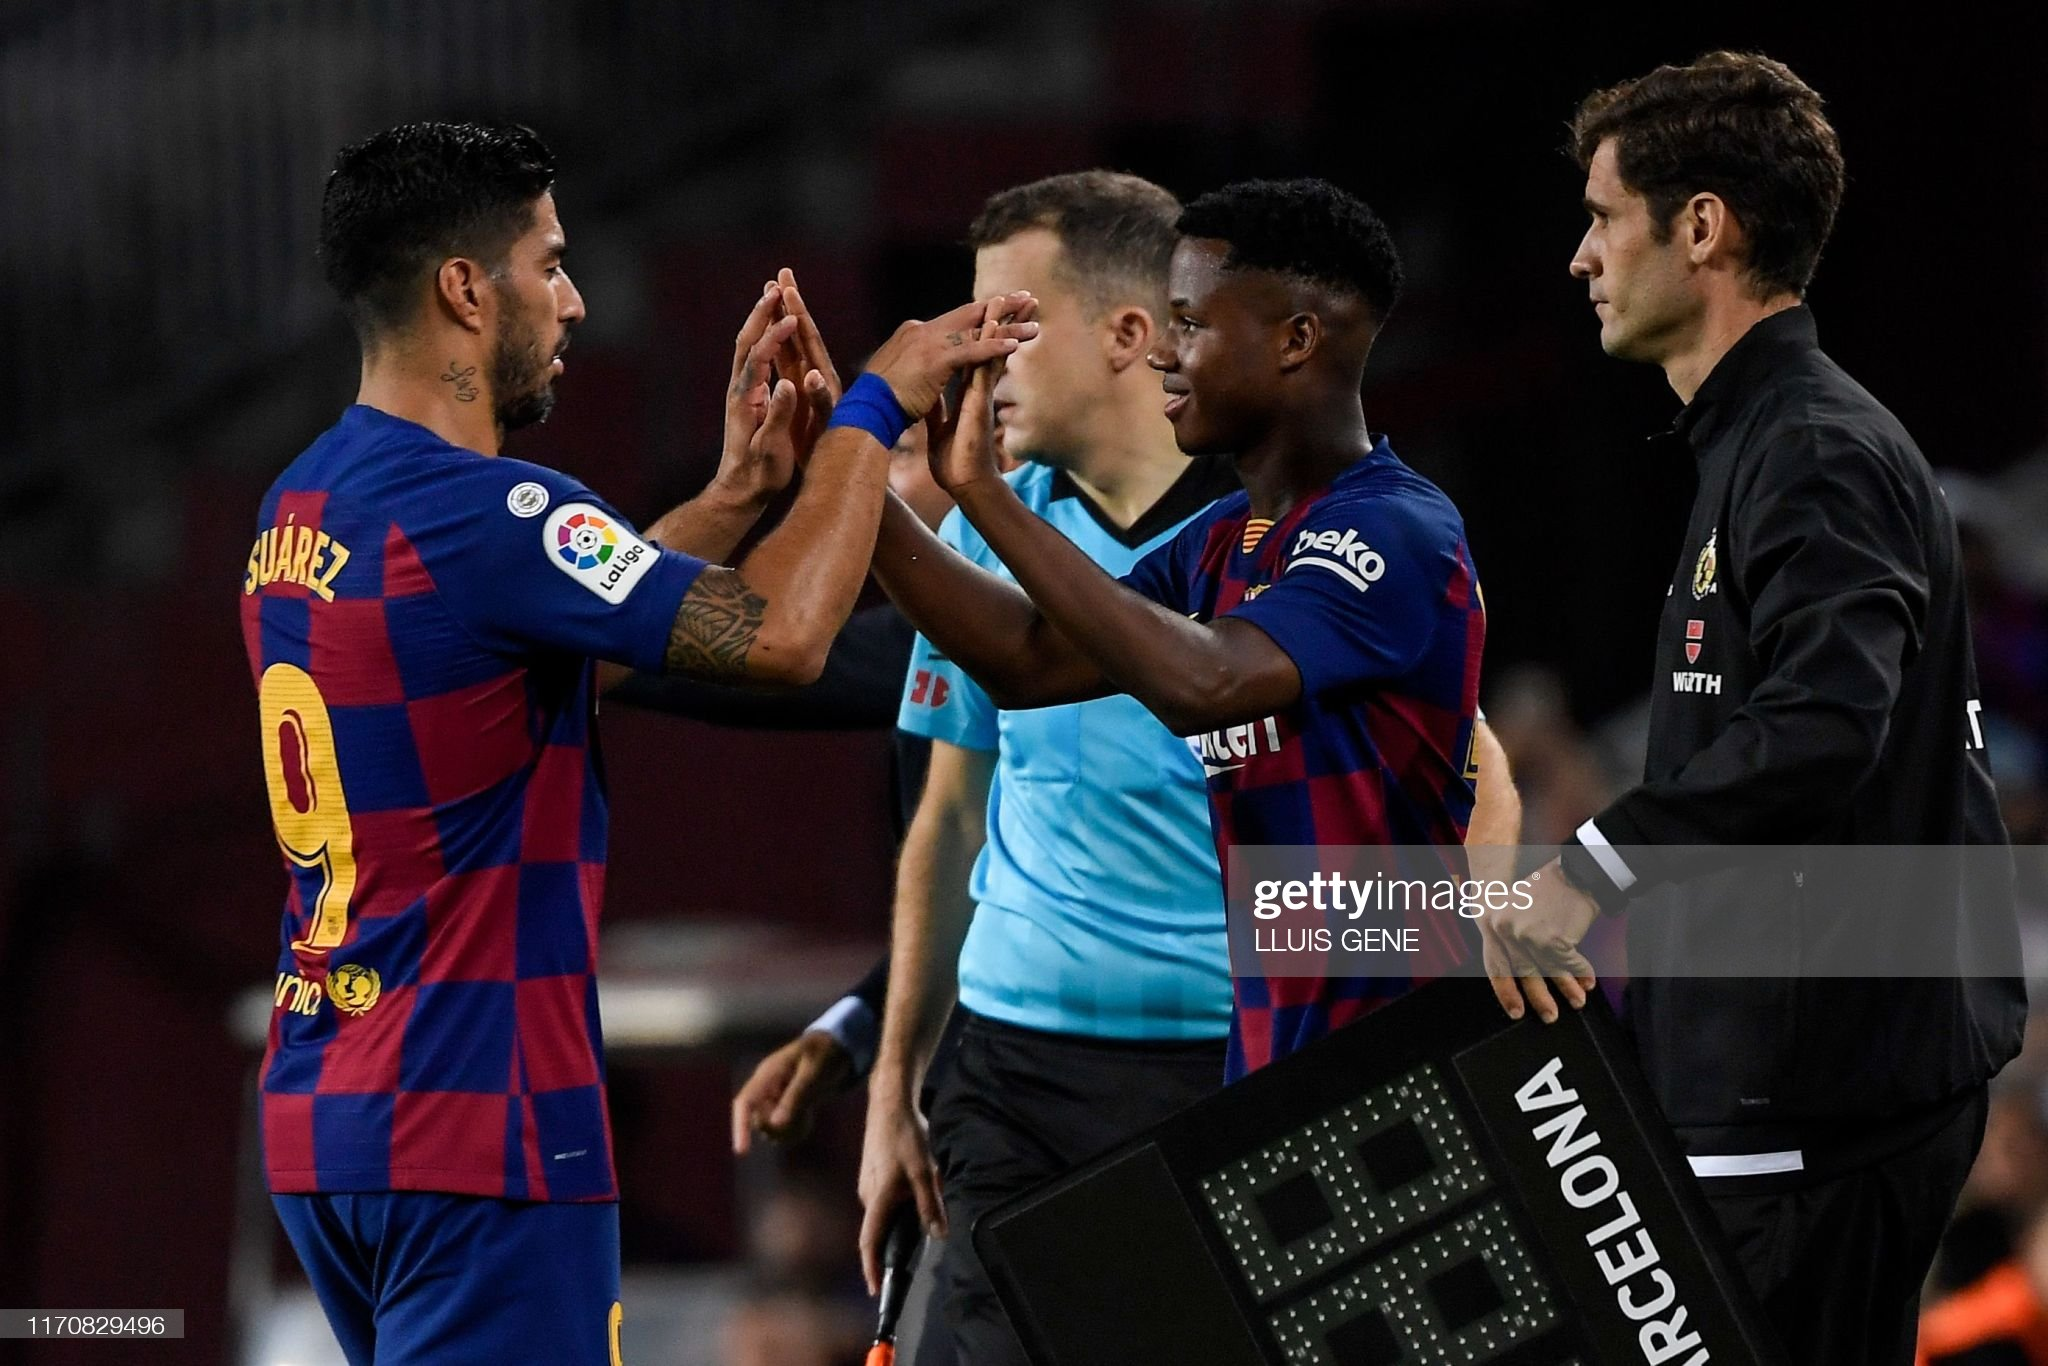 صور مباراة : برشلونة - فياريال 2-1 ( 24-09-2019 )  Barcelonas-uruguayan-forward-luis-suarez-is-substituted-off-for-picture-id1170829496?s=2048x2048